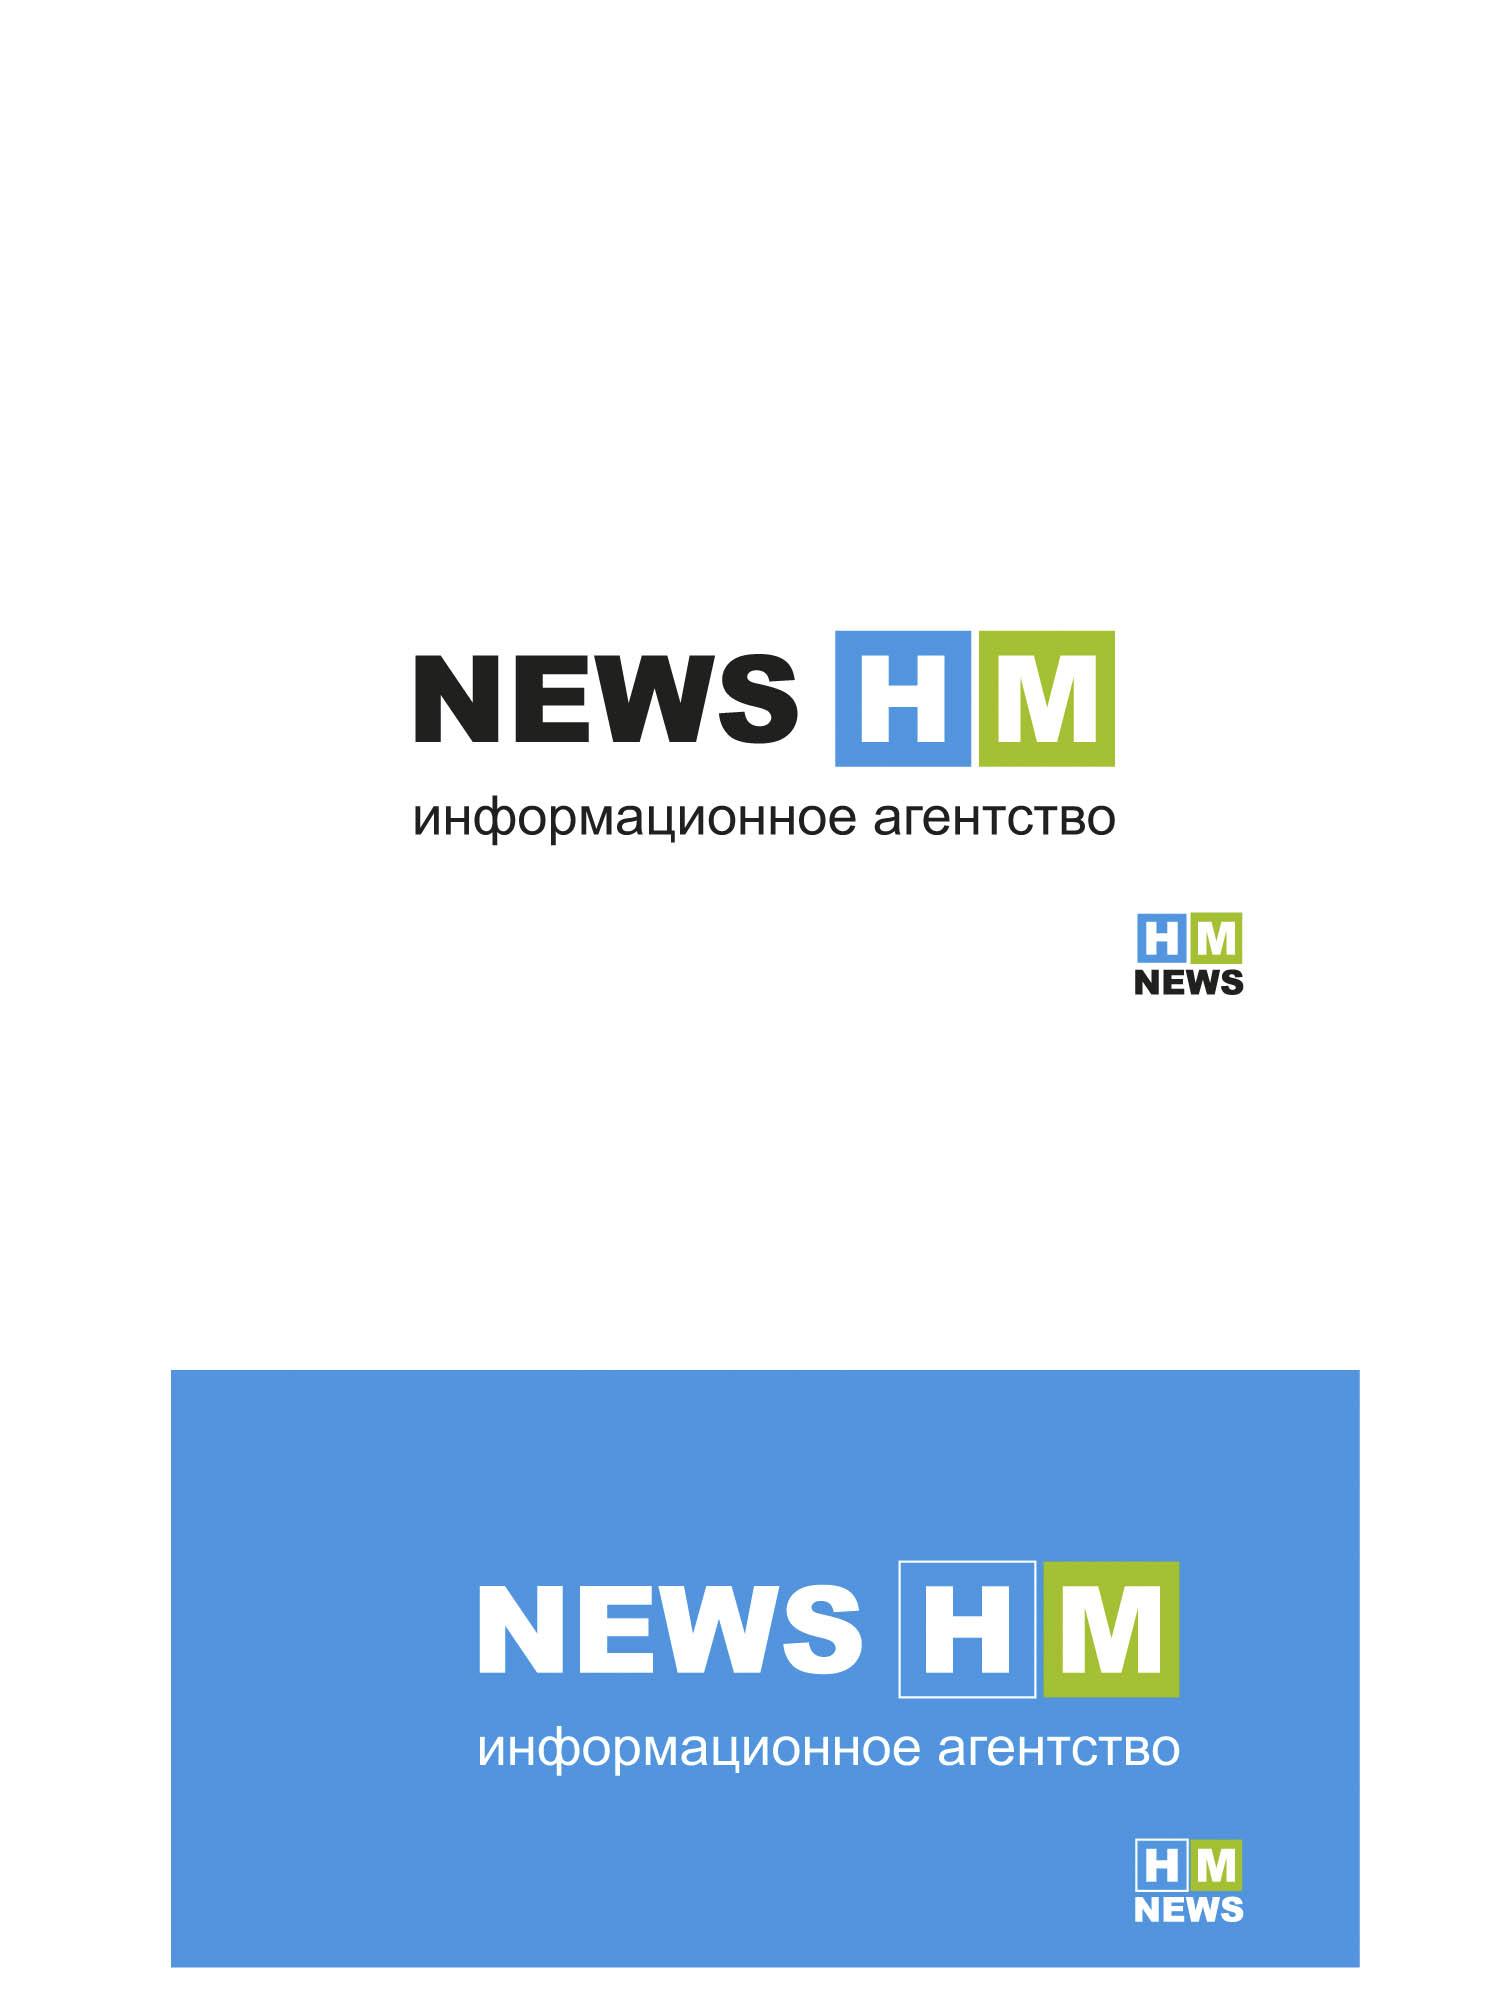 Логотип для информационного агентства фото f_6695aa51aec827ff.jpg